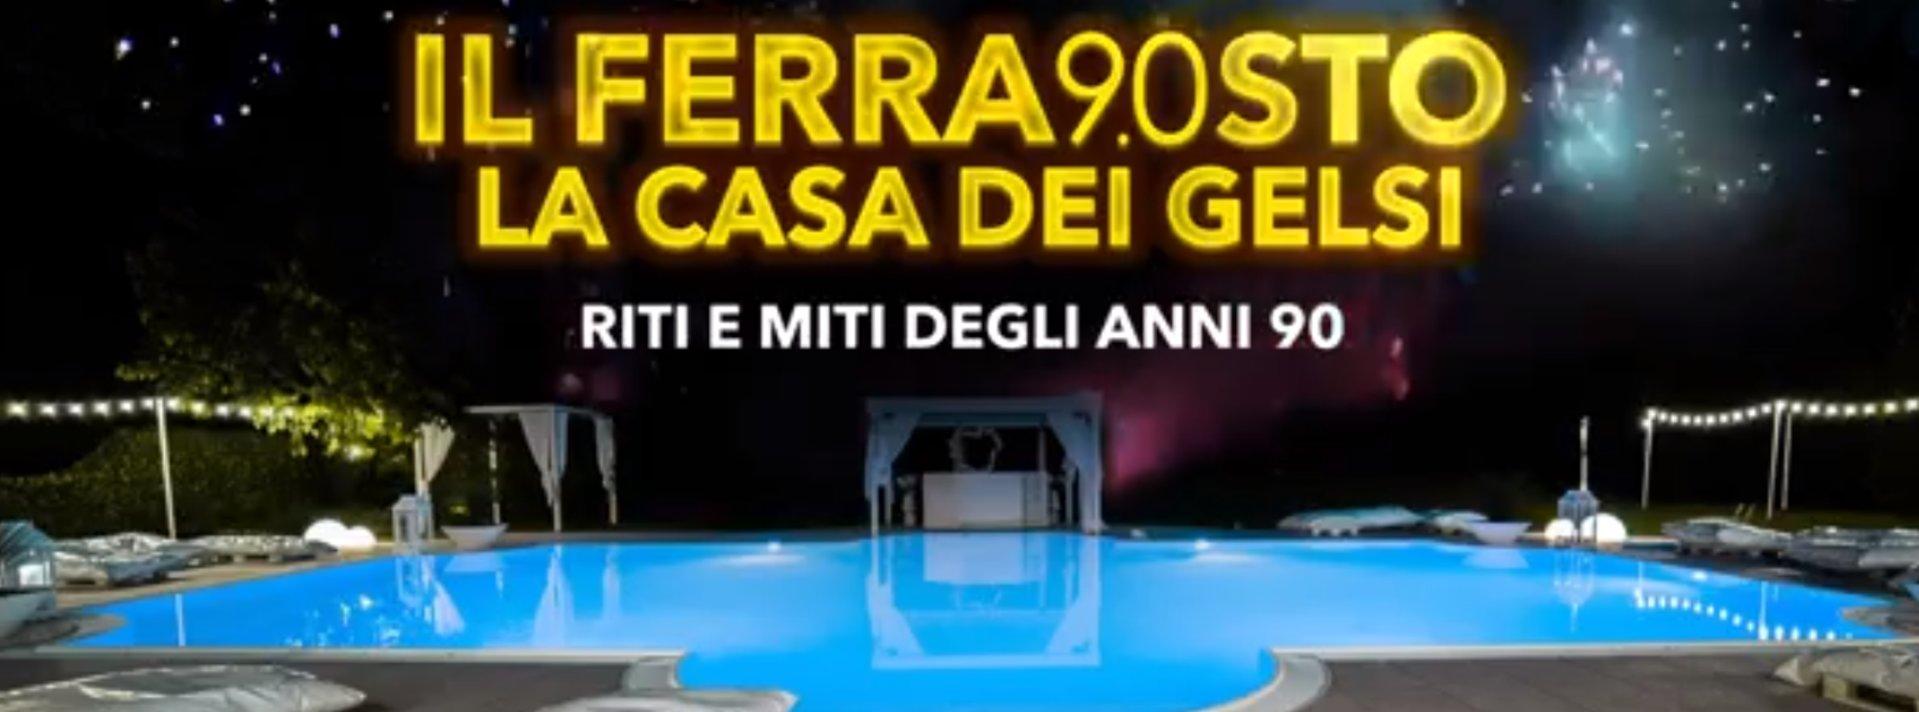 Ferragosto gelsi 2019 anni 90